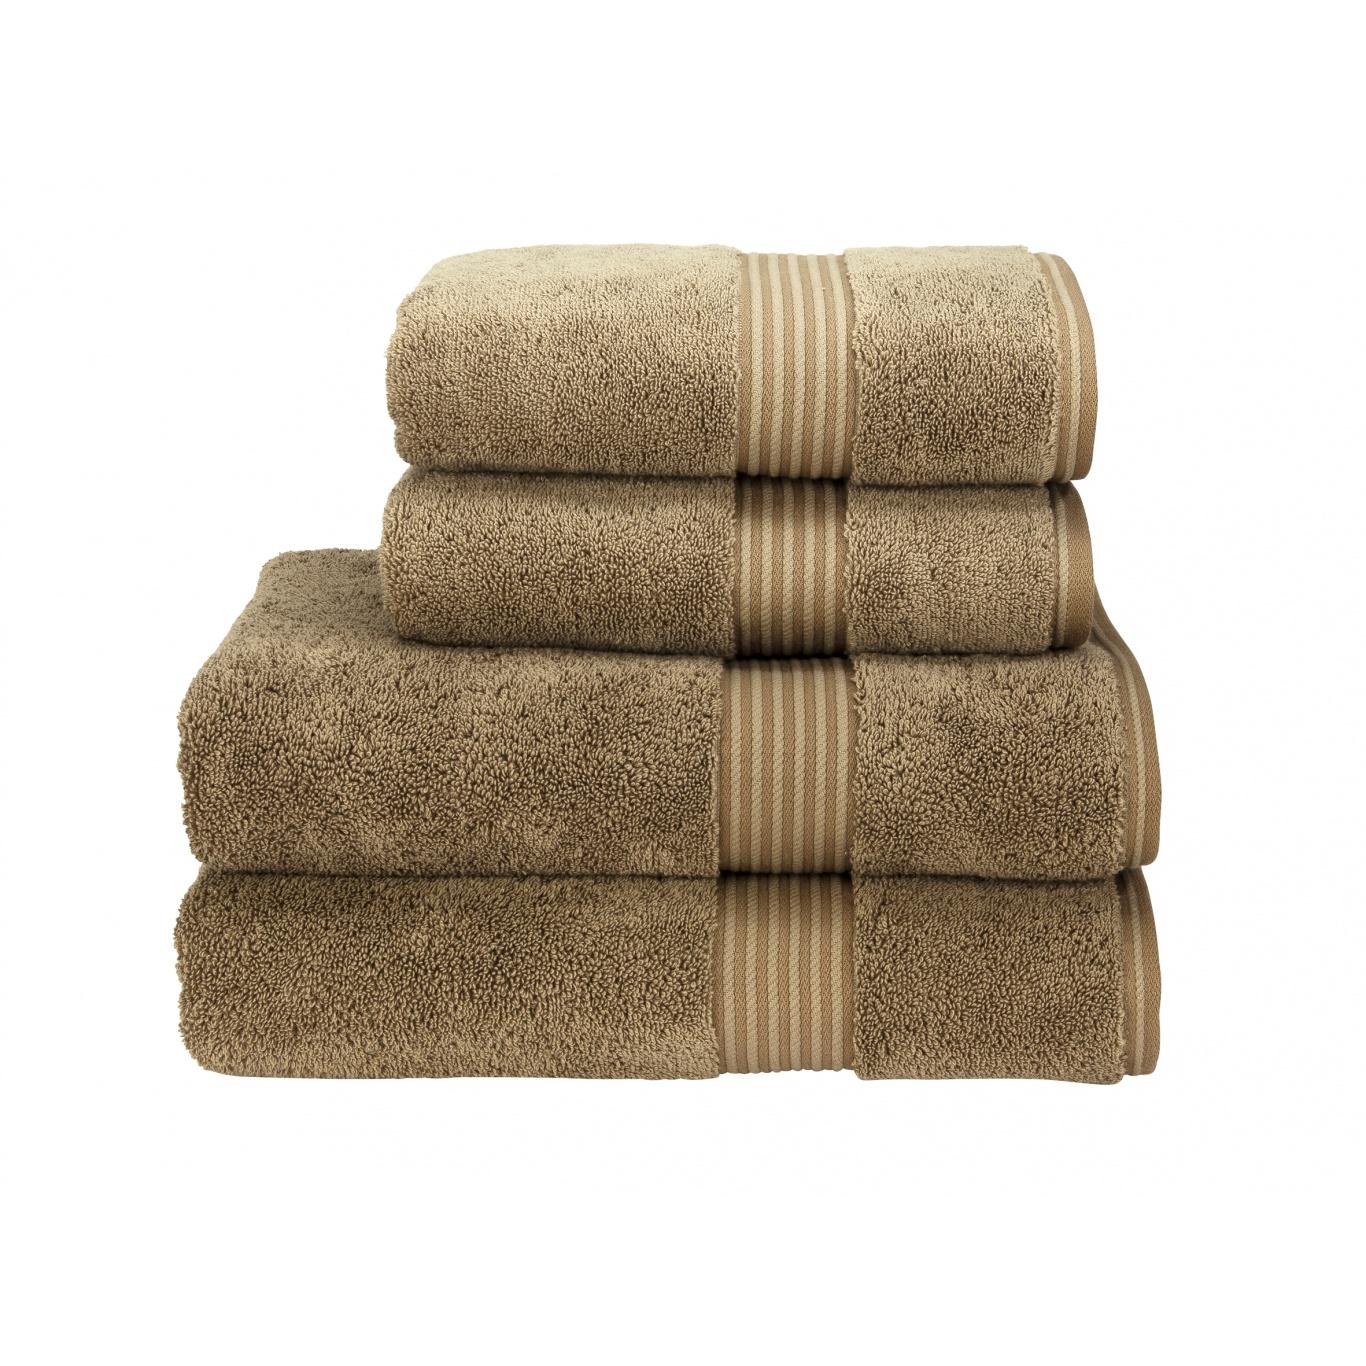 Image of Christy Supreme Supima Hygro Mocha Towels